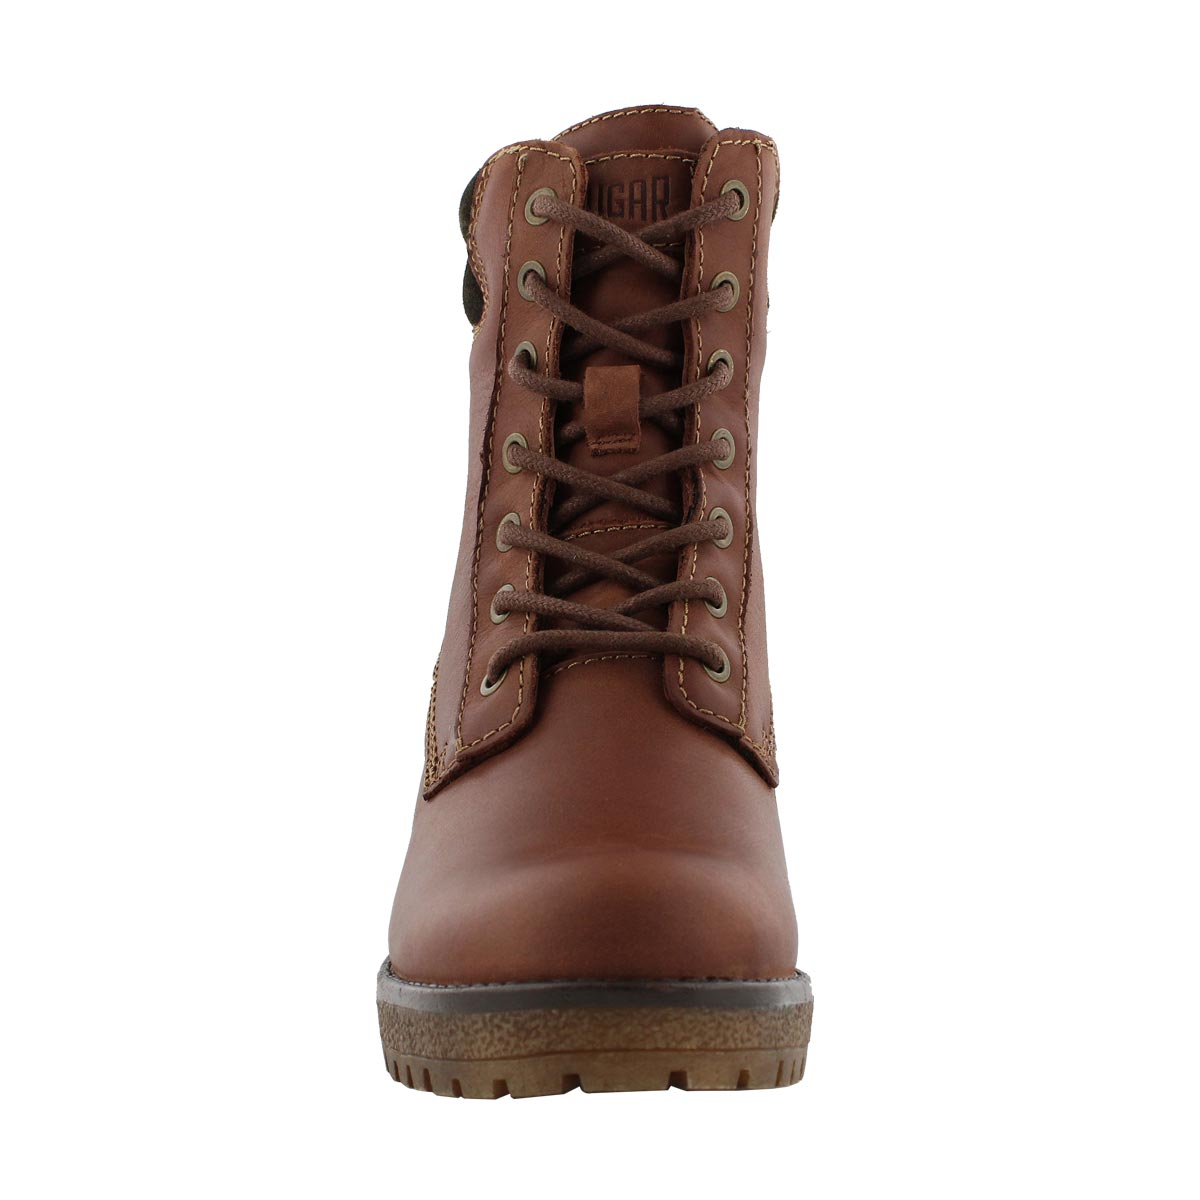 Lds Danbury brn wtpf winter boot